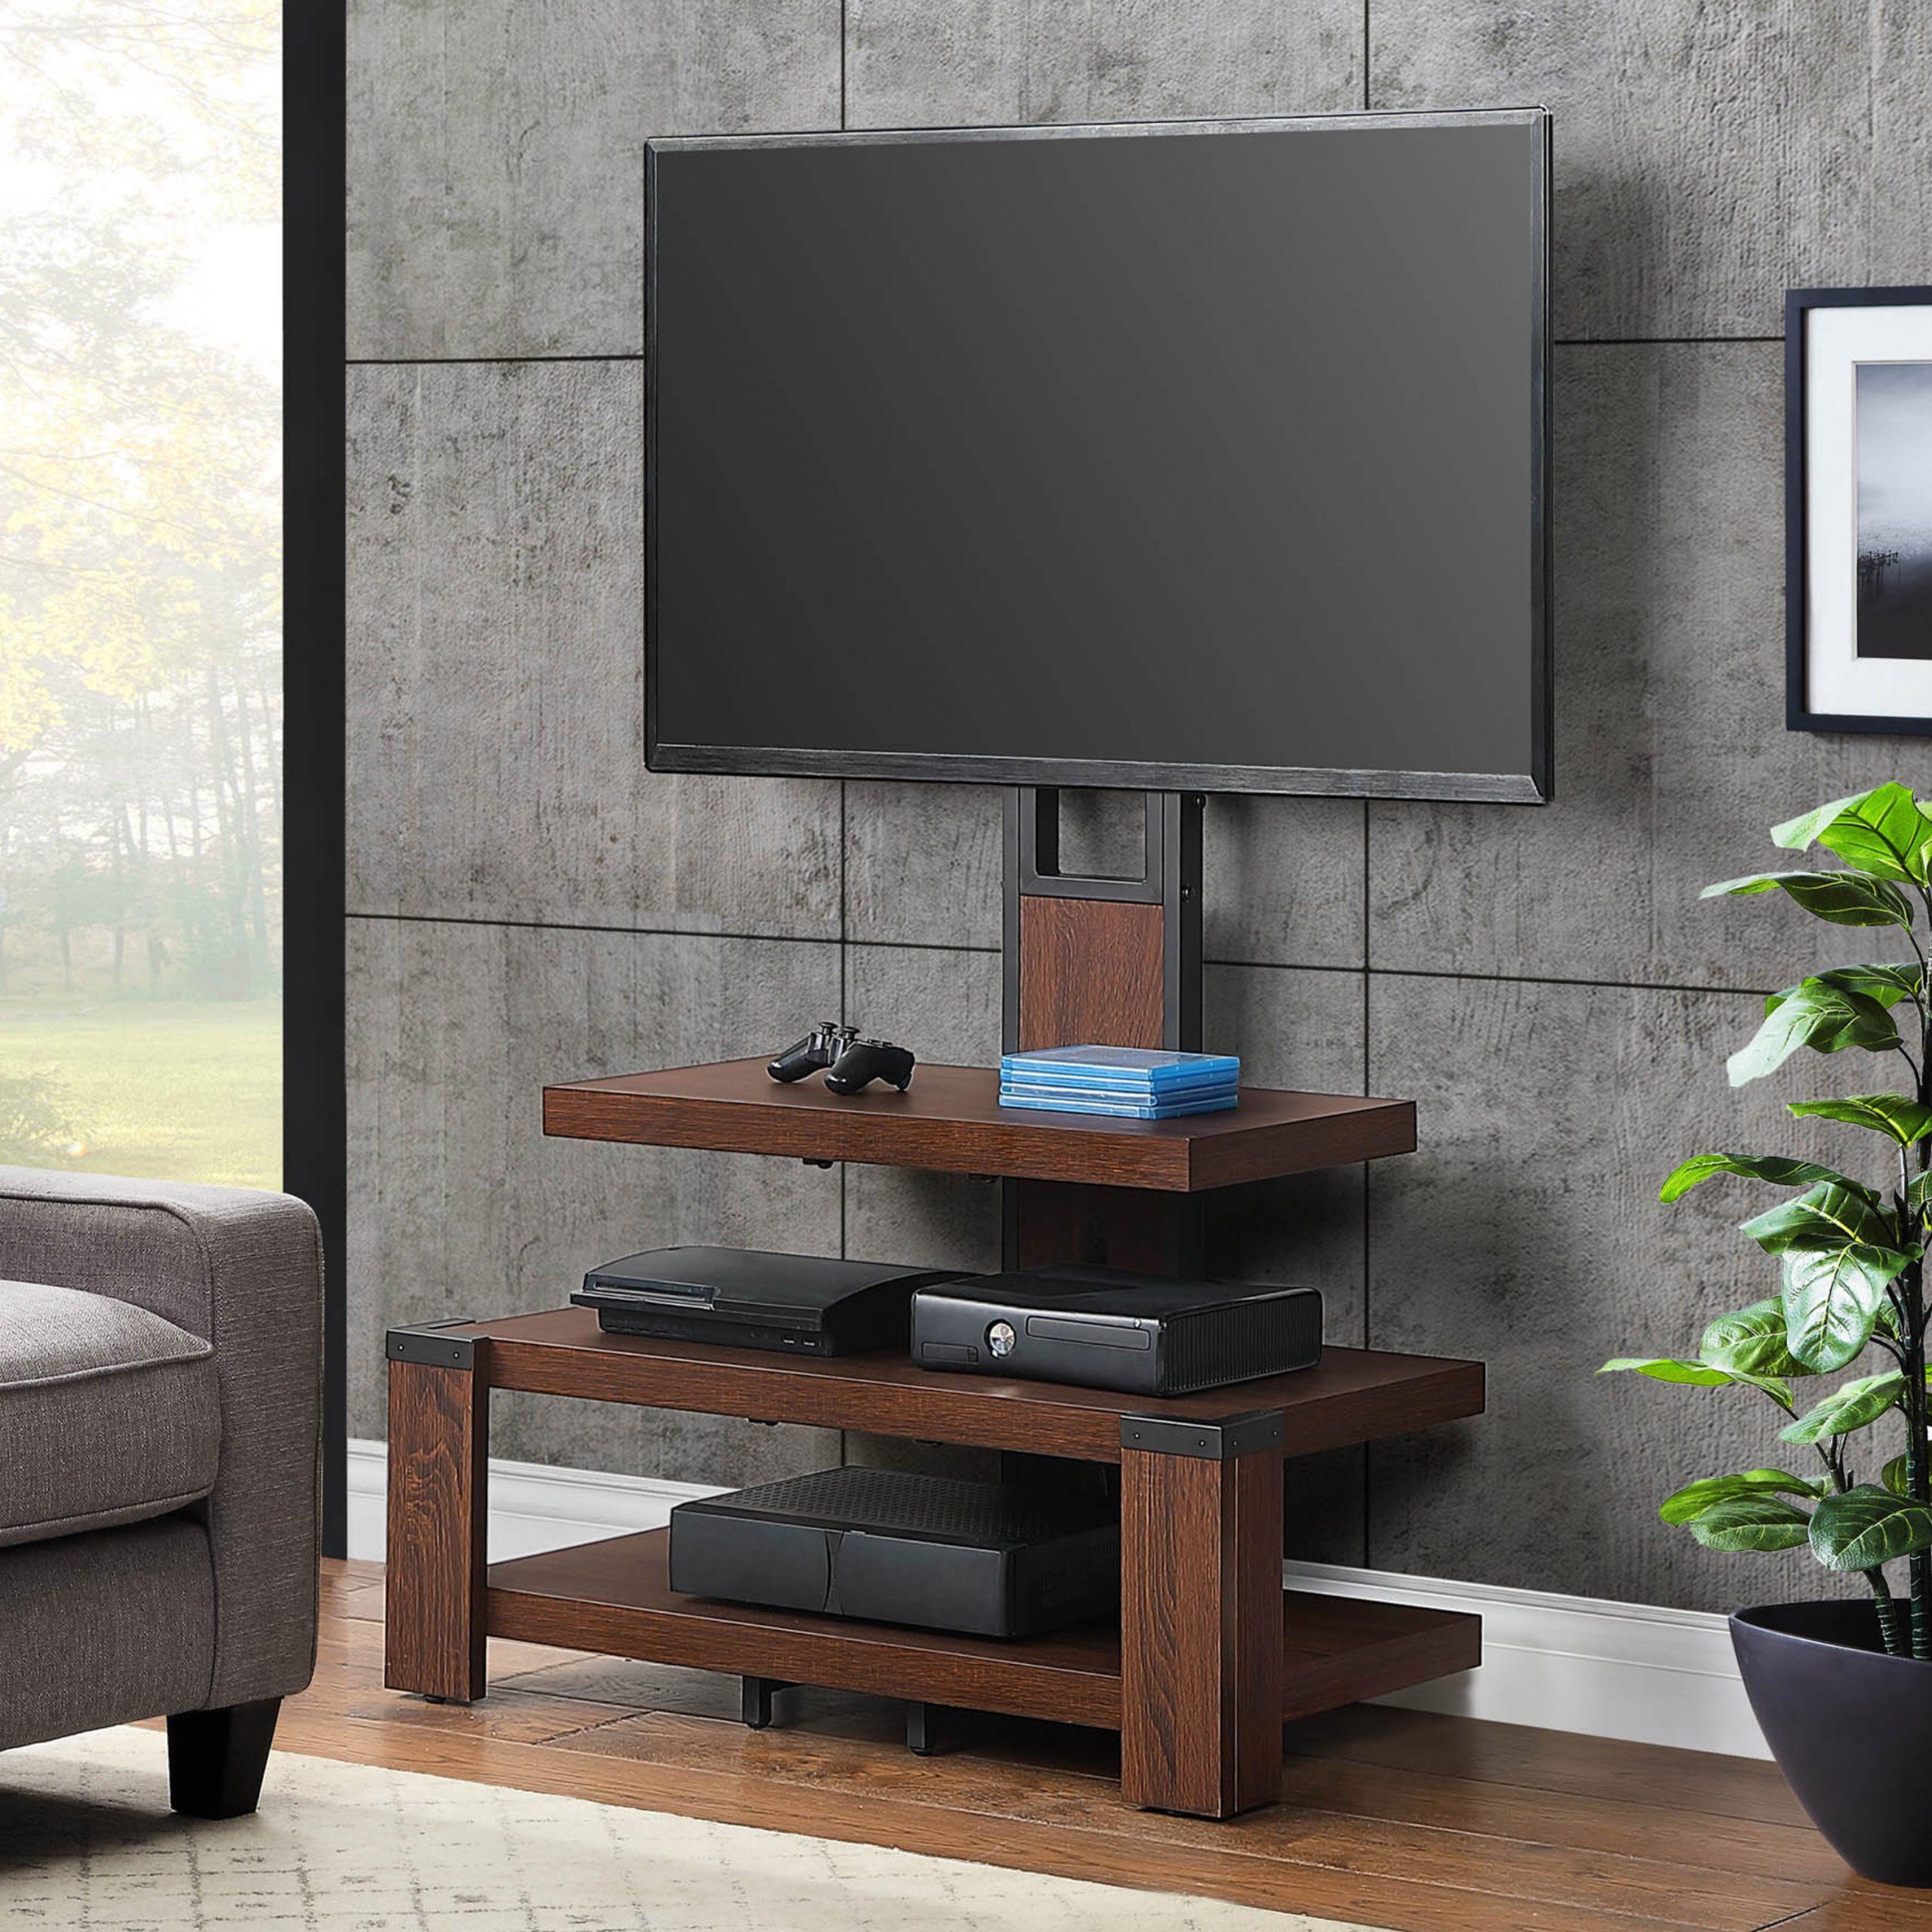 Brown Whalen Shelf Tv Stands (View 3 of 6)